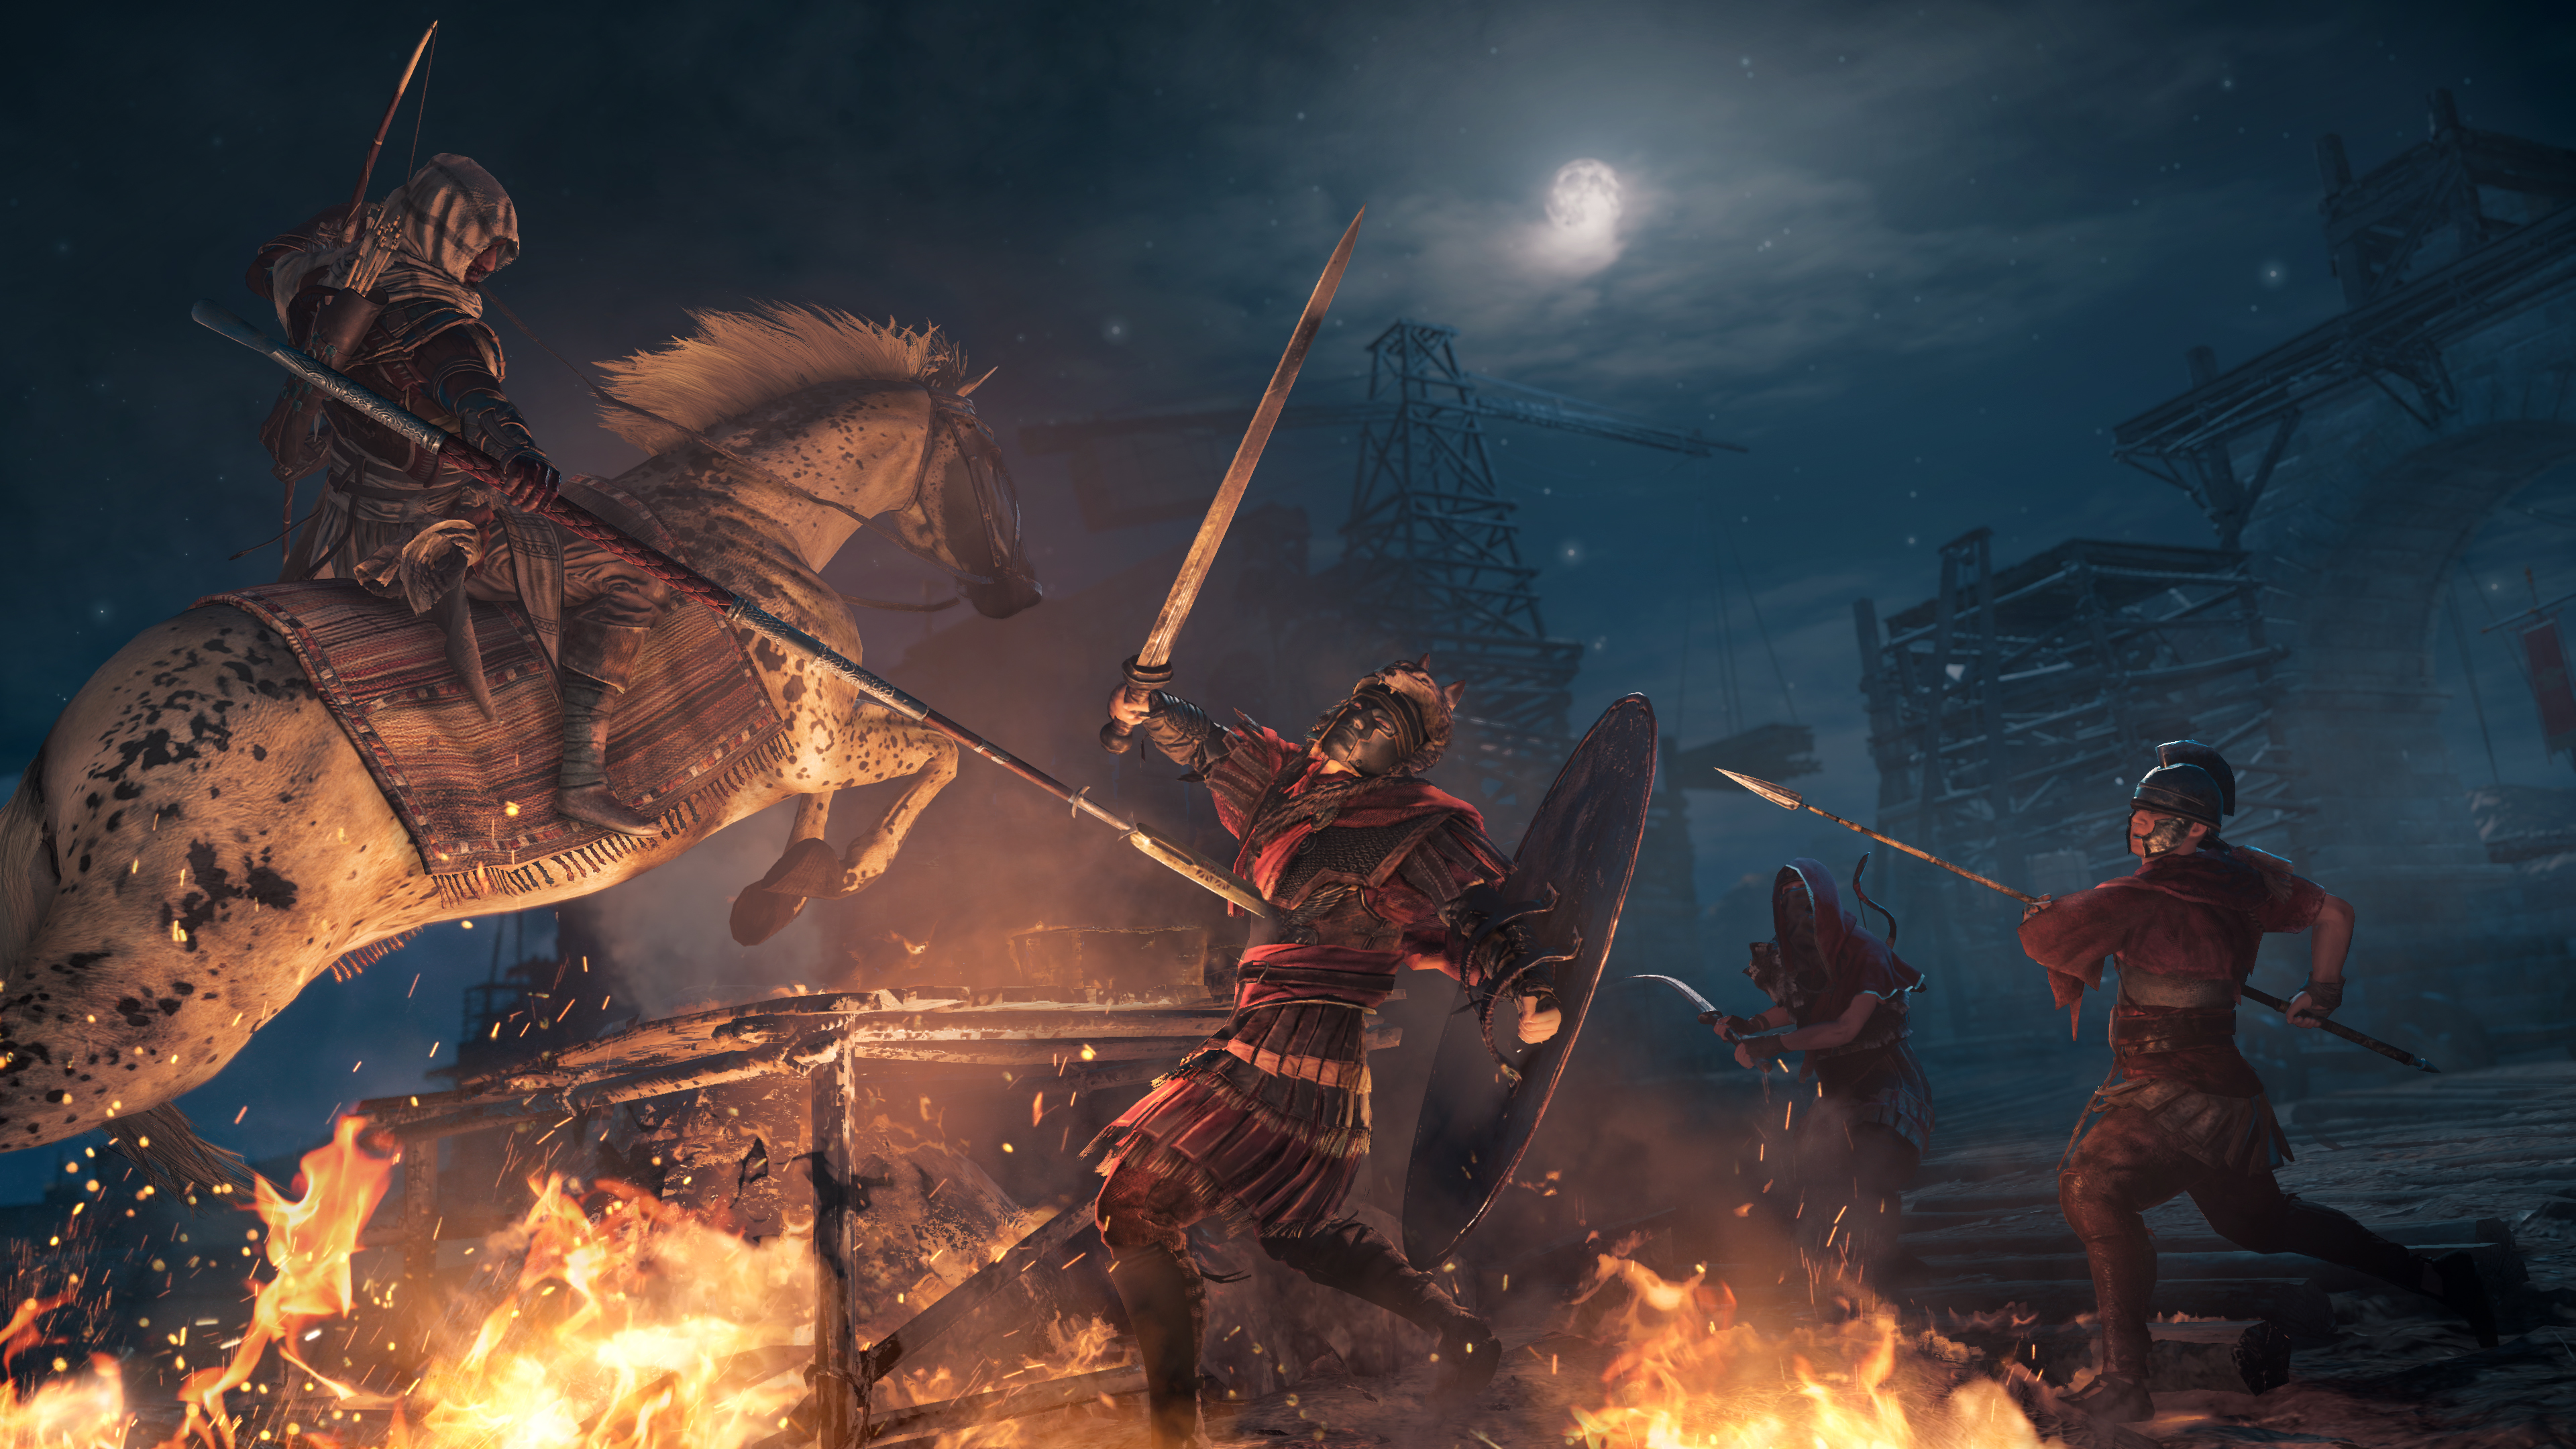 Assassins Creed Origins 4k Ultra Hd Wallpaper Background